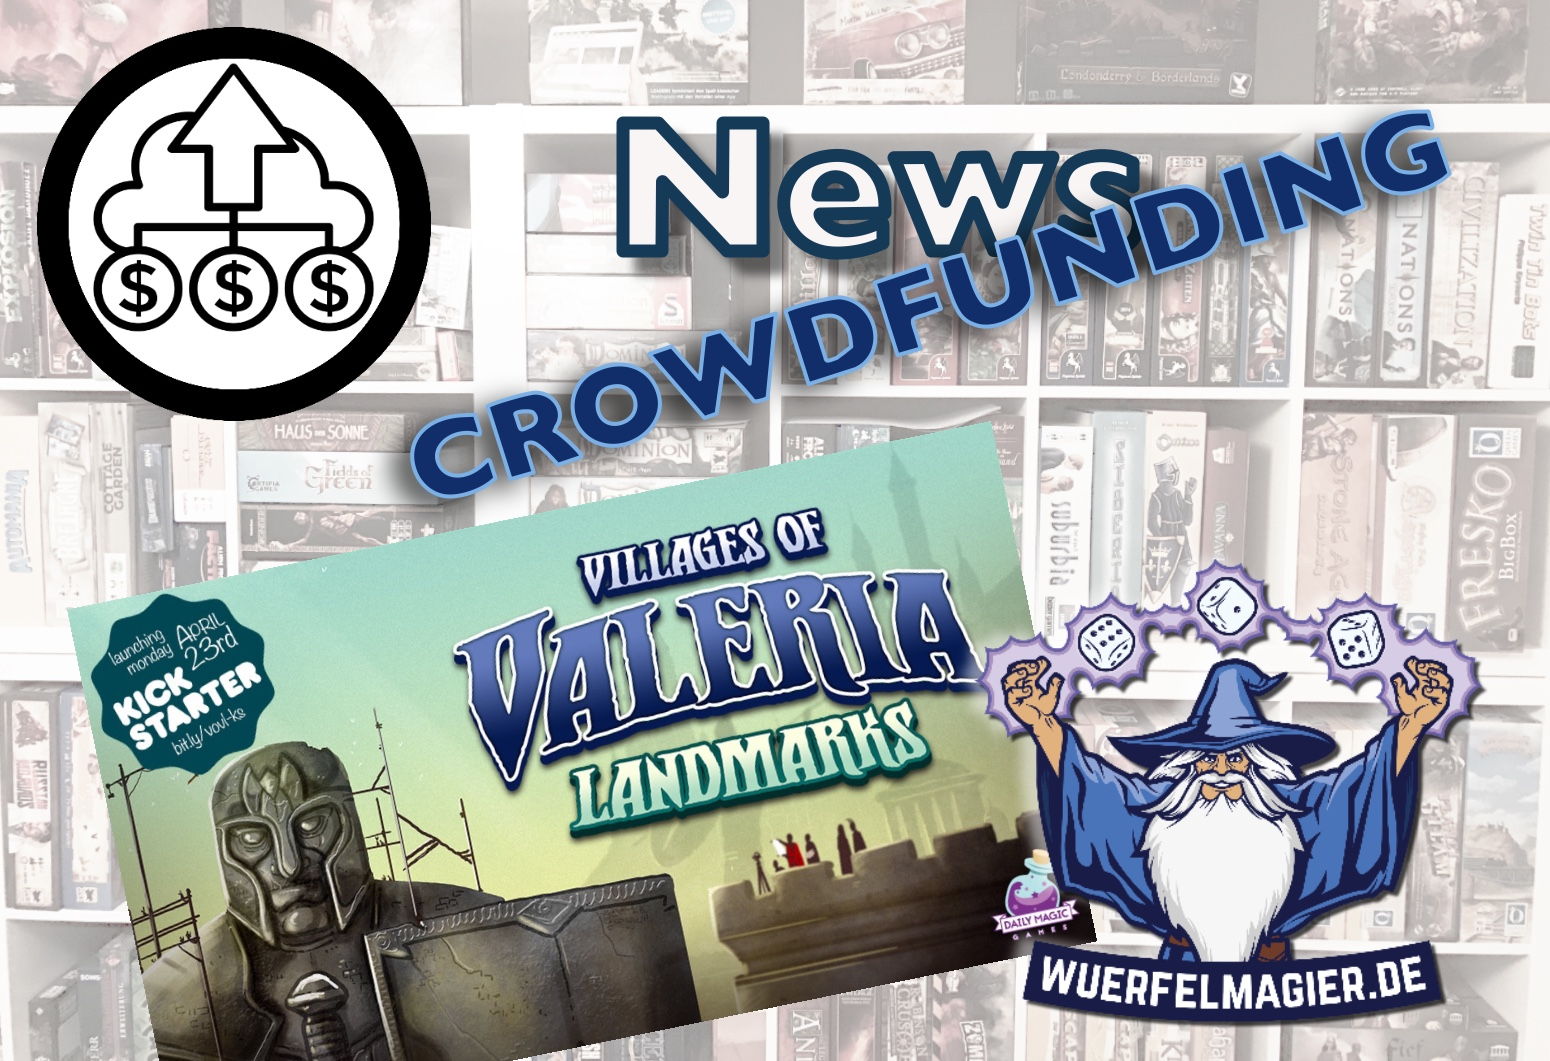 News Würfelmagier Crowdfunding Valeria Landmarks